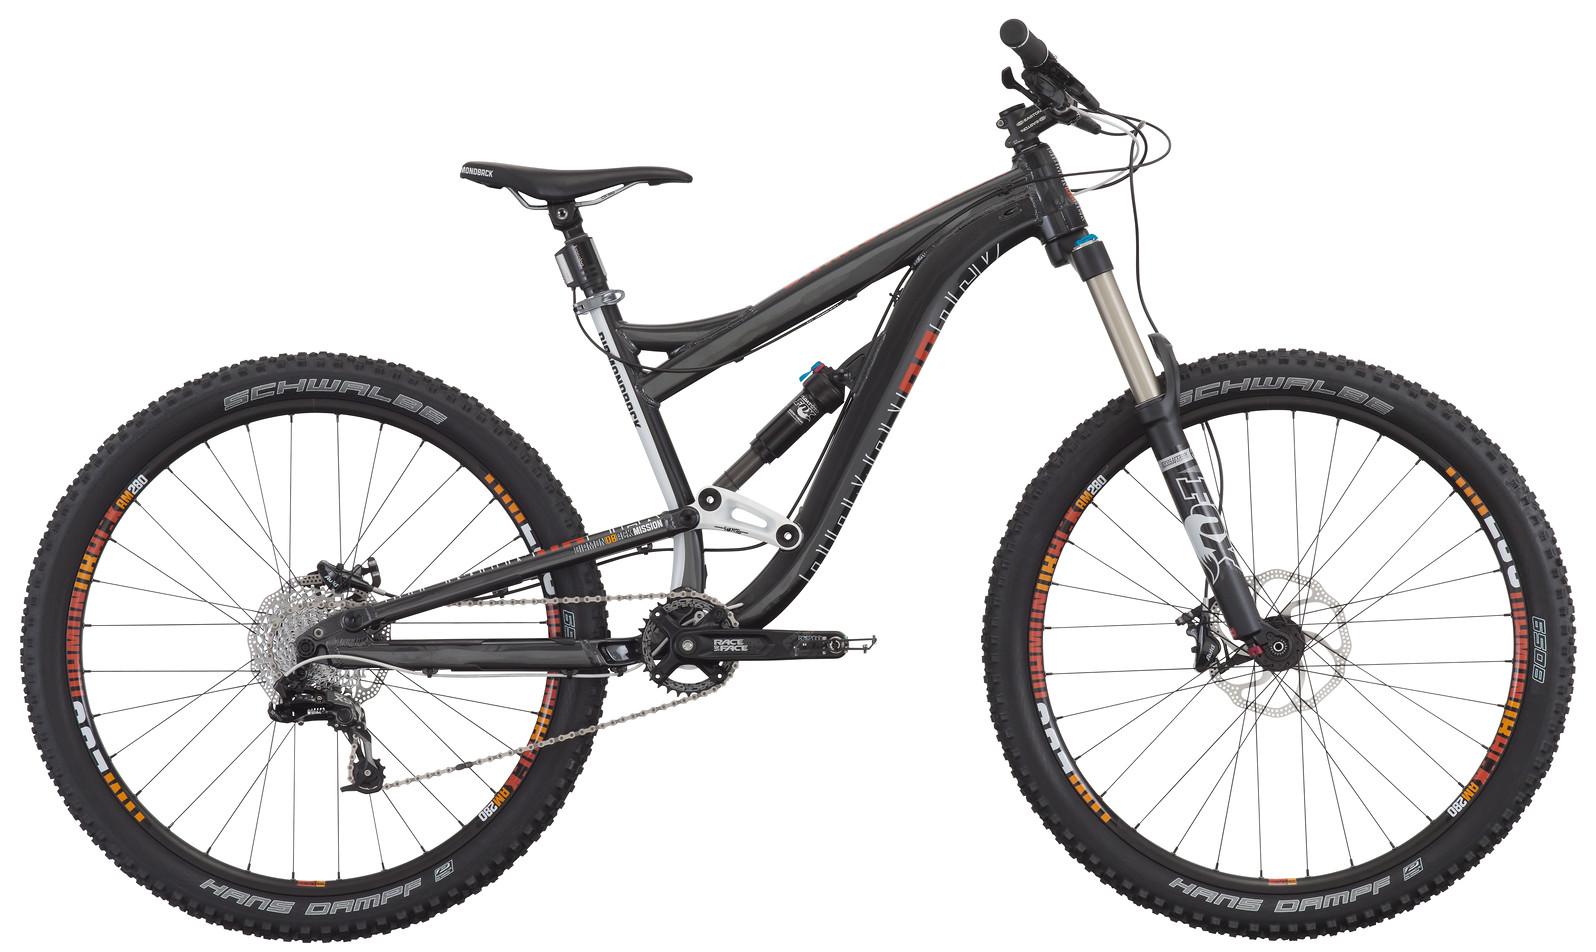 2015 Diamondback Mission Two 27.5 Bike - Grey